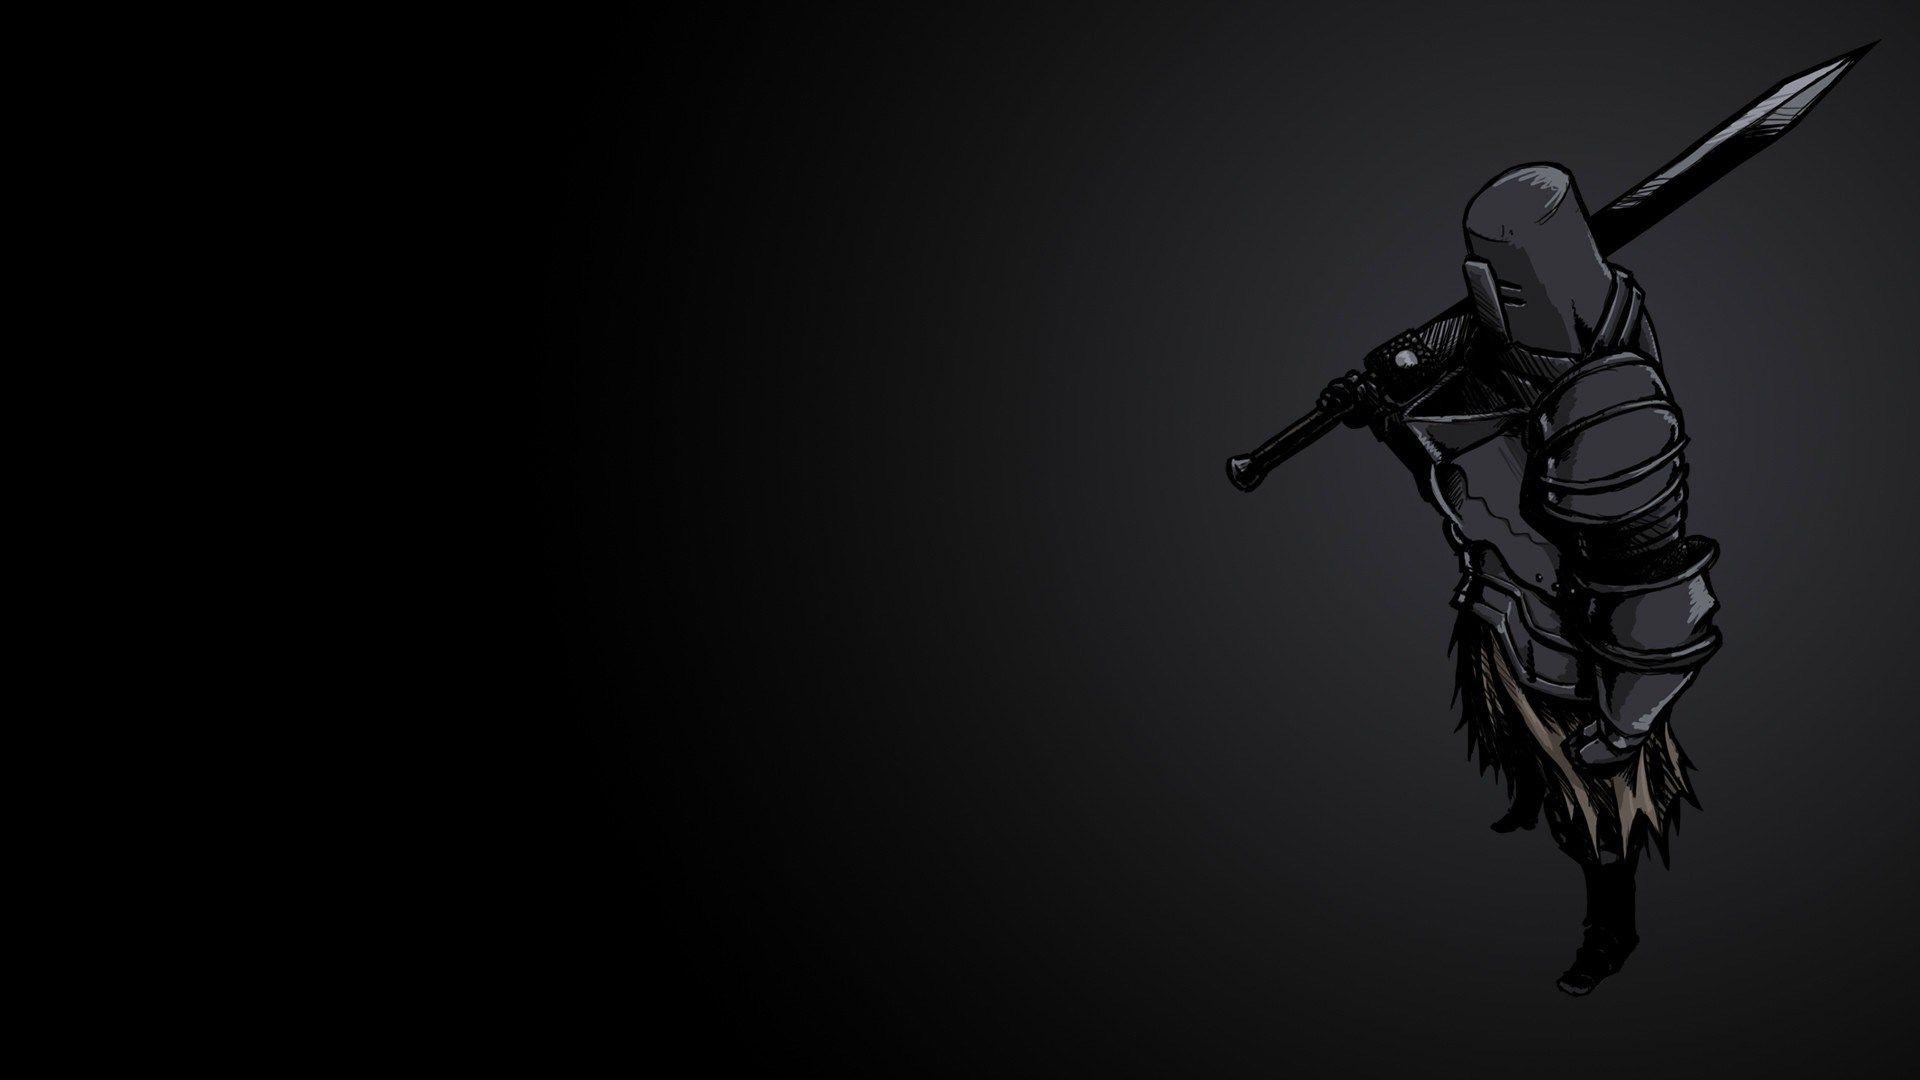 Free Desktop Hd Black Wallpapers